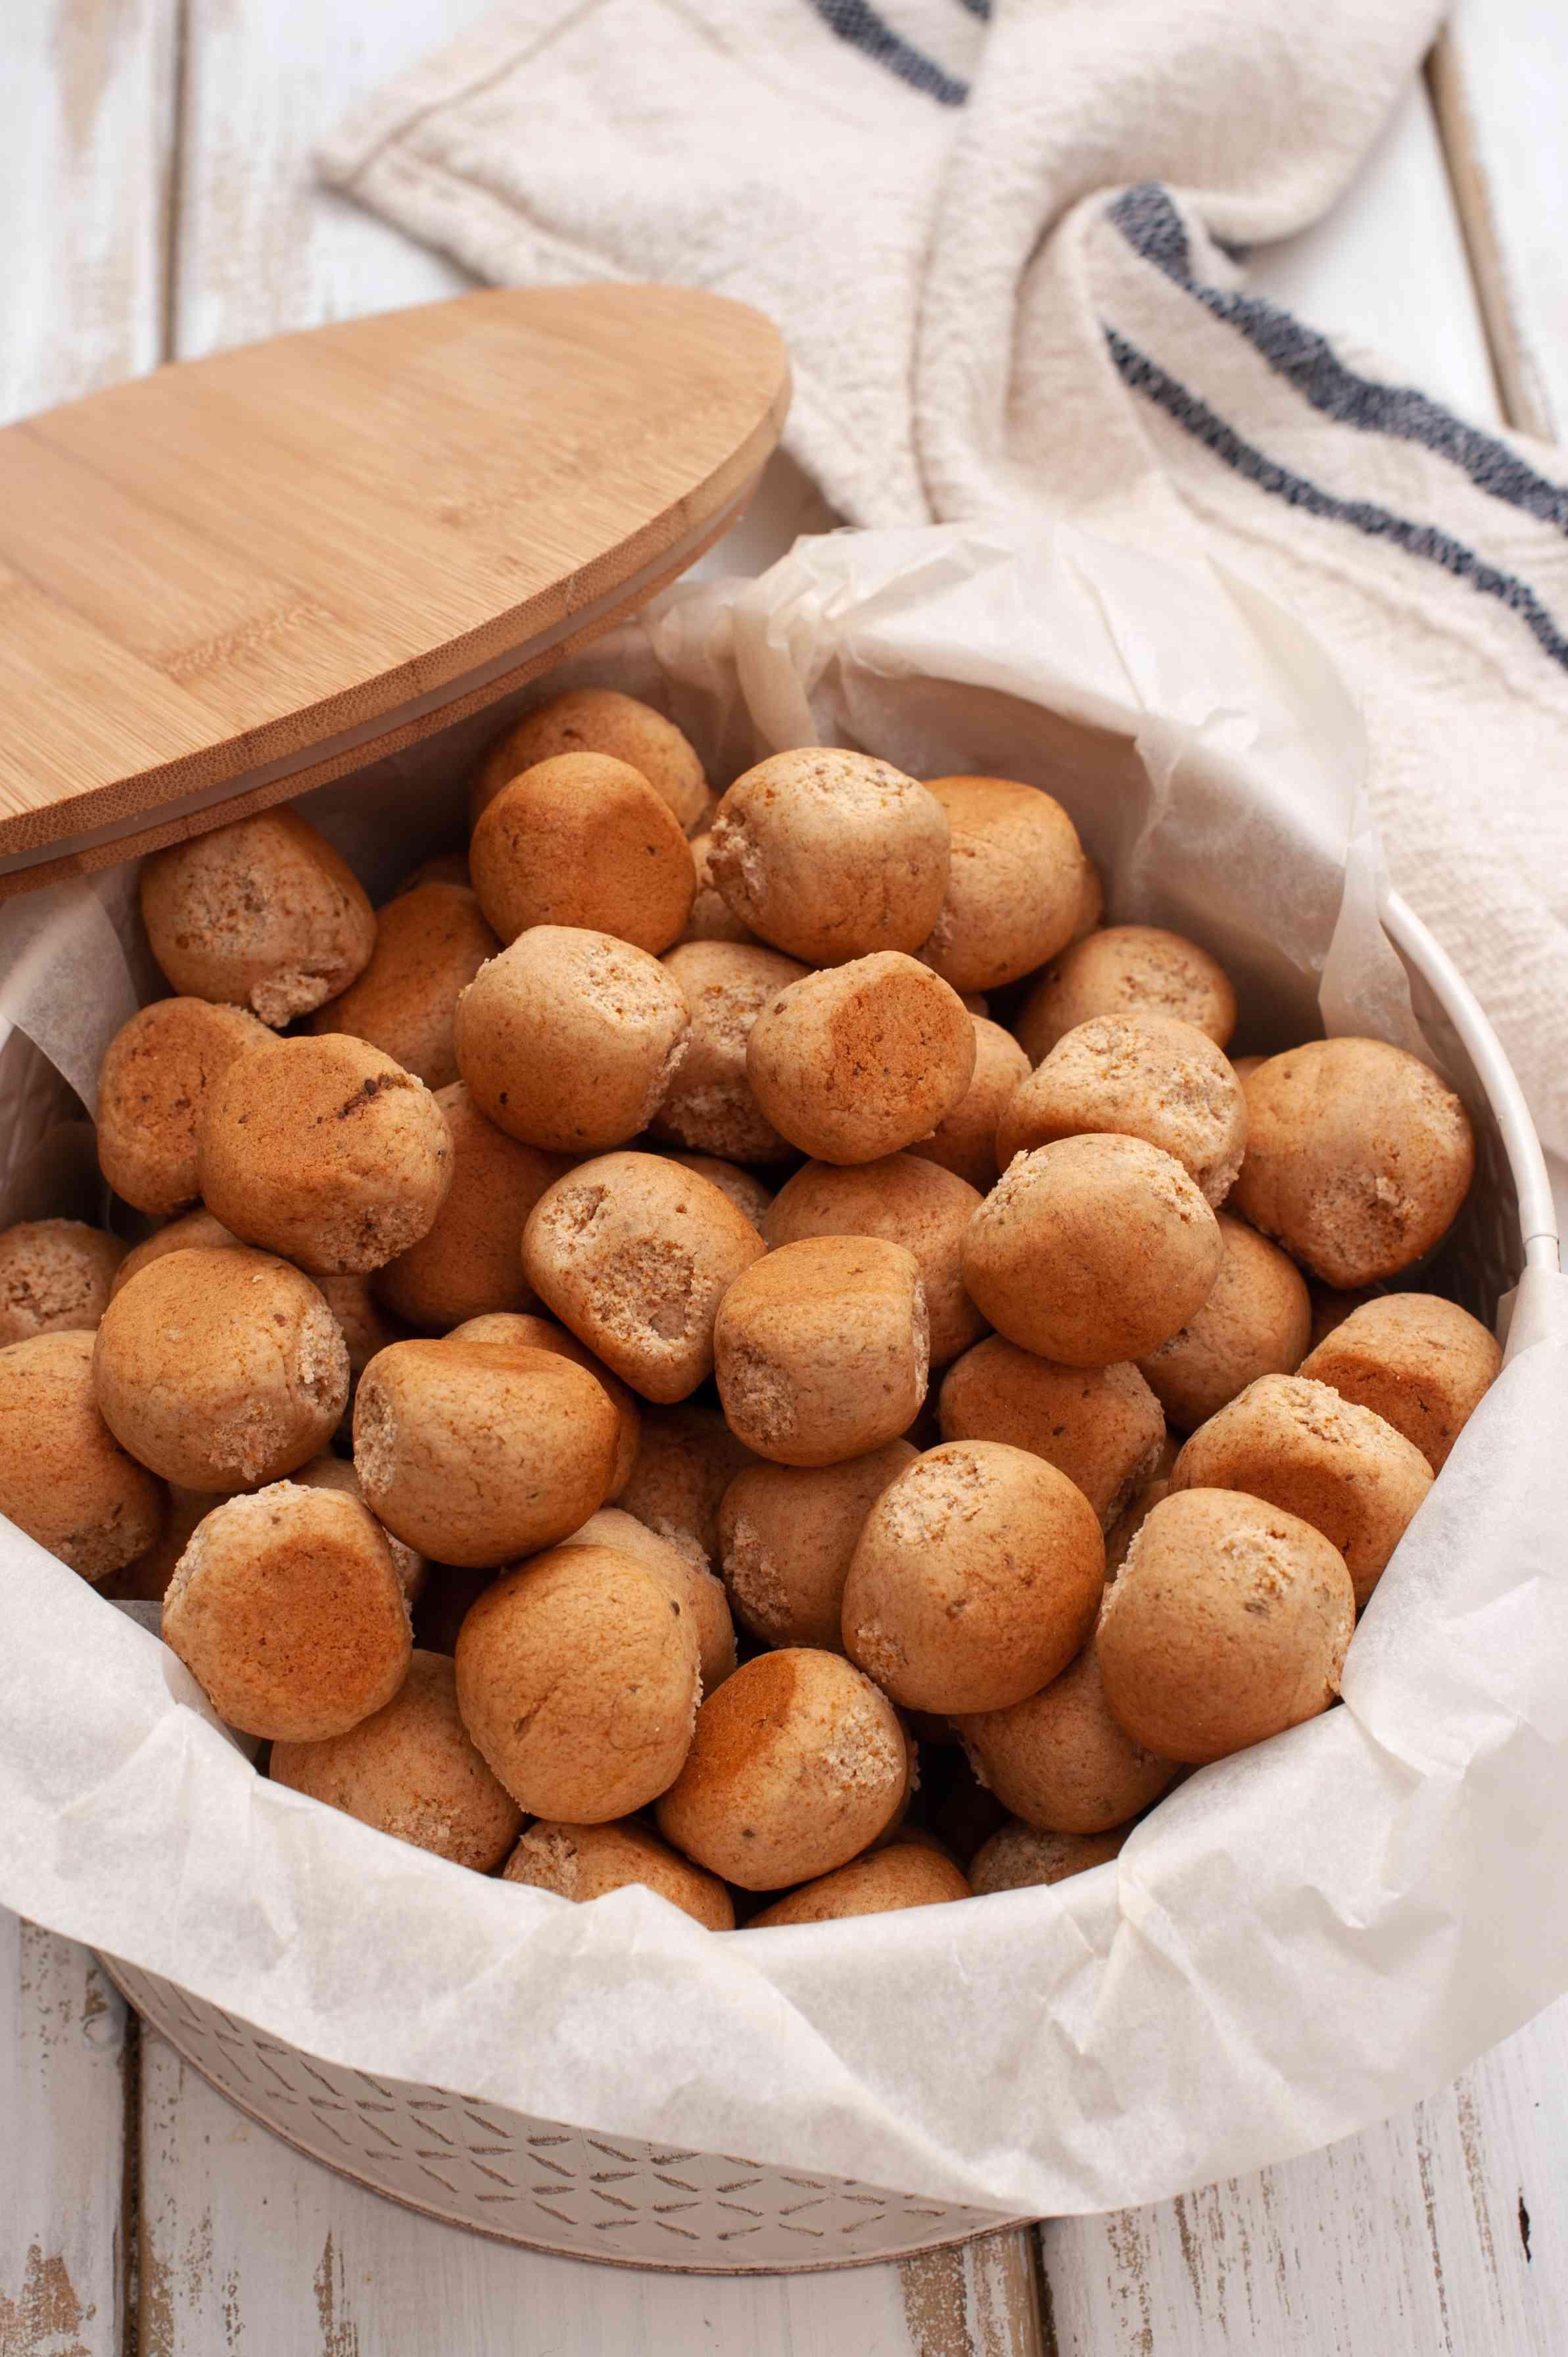 Traditional pepernoten